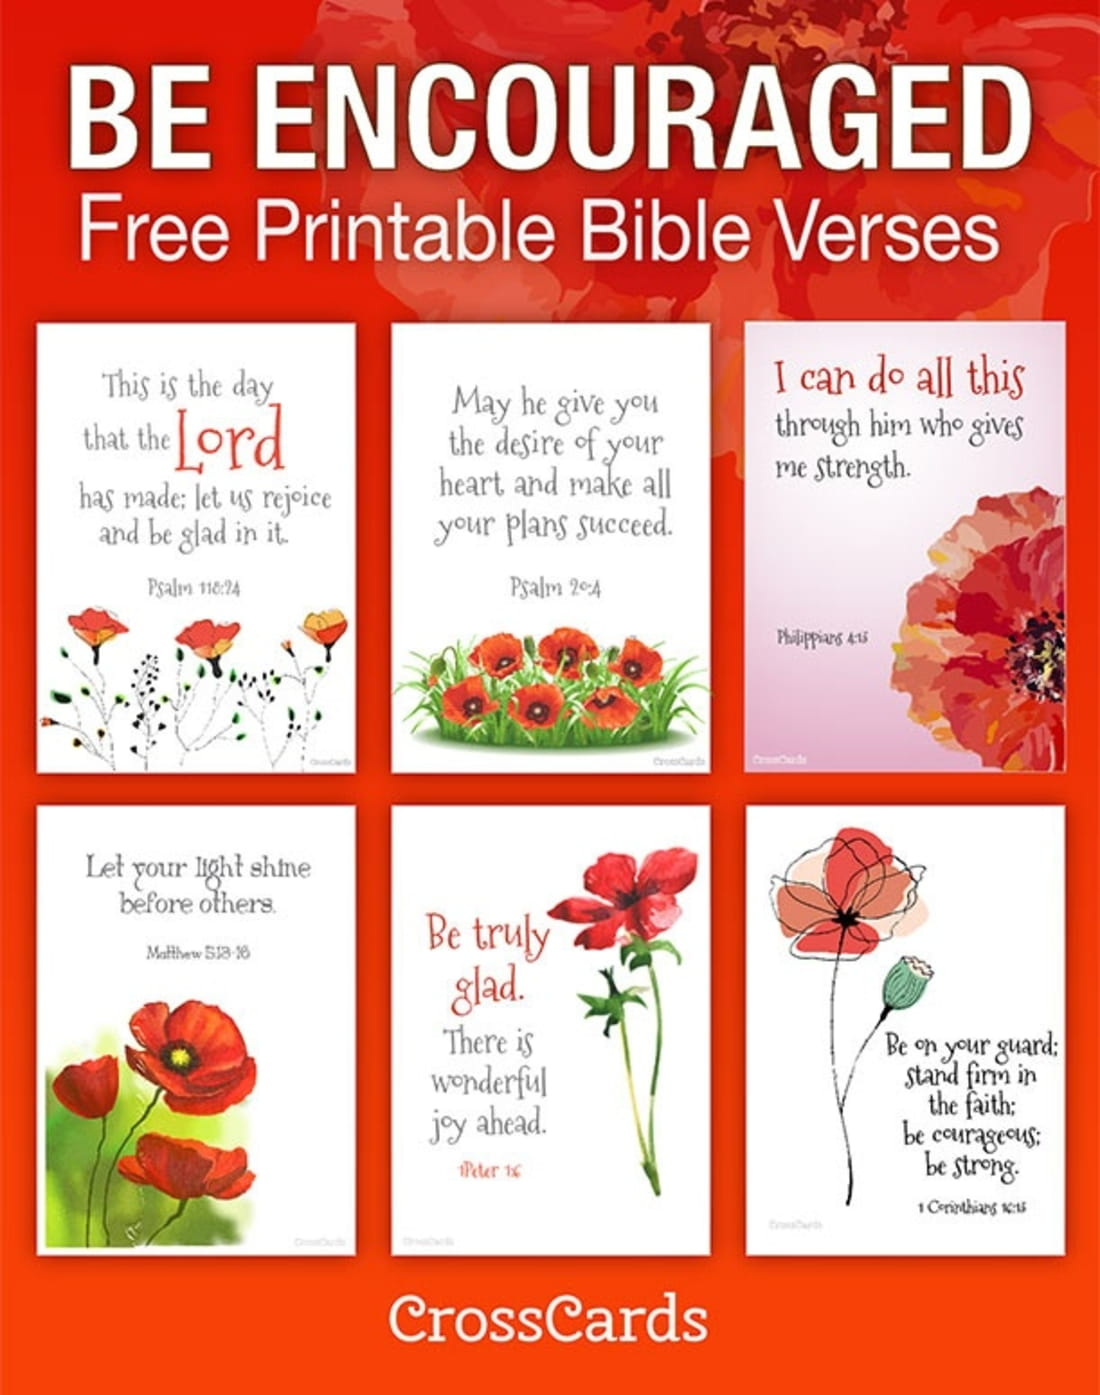 Be Encouraged Free Printable Bible Verses Printable